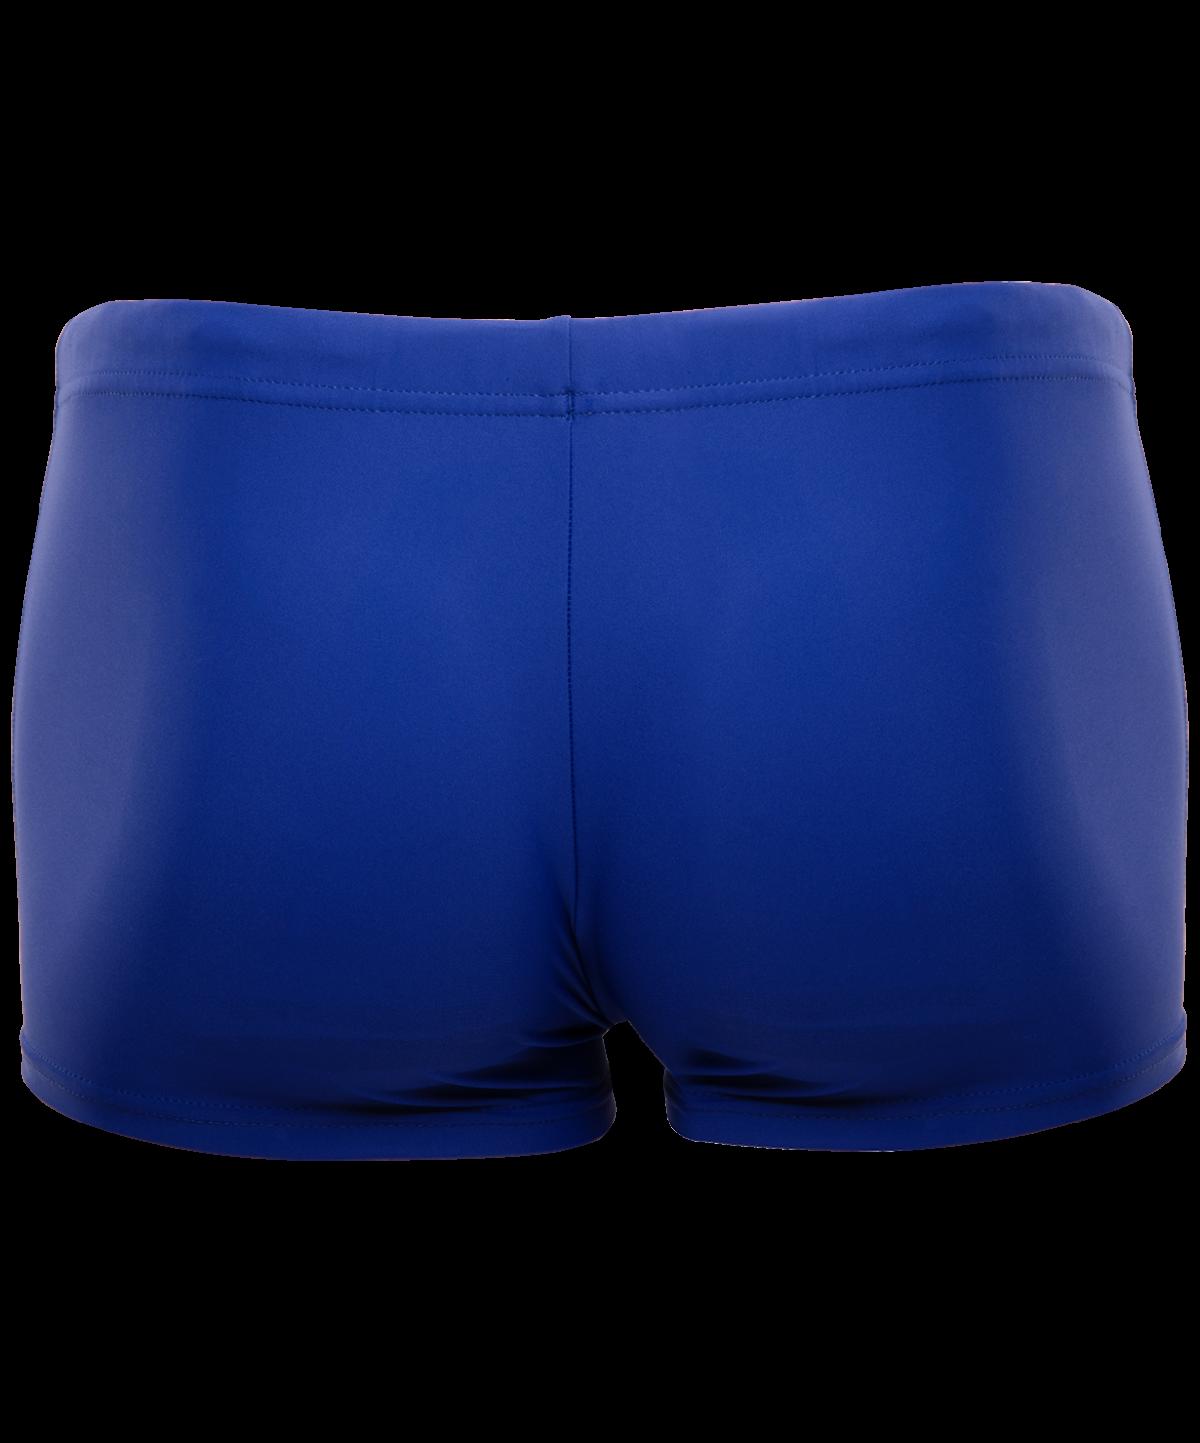 COLTON Simple Плавки-шорты детские (36-42)  SS-2984: синий - 2